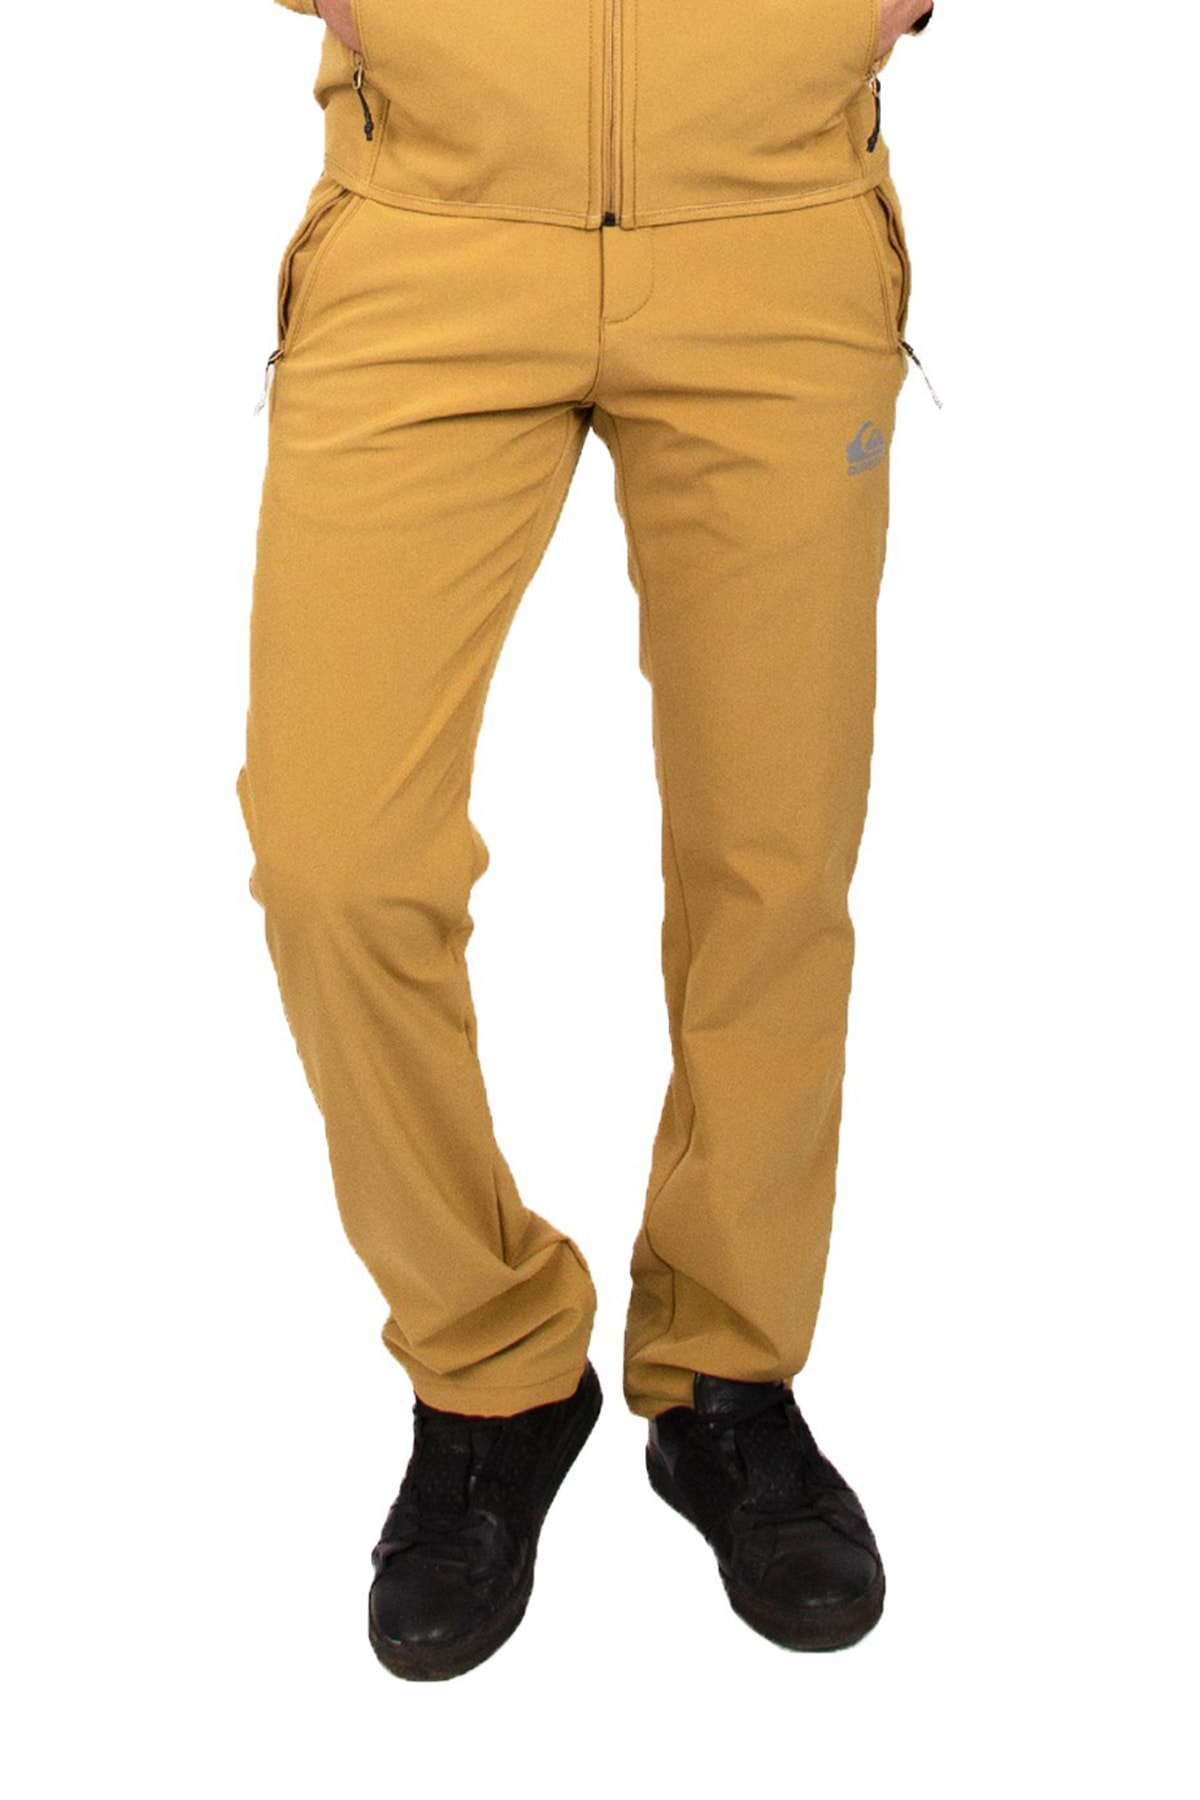 Quiksilver Erkek Pantolon - OD Softshell - EQYNP03712T